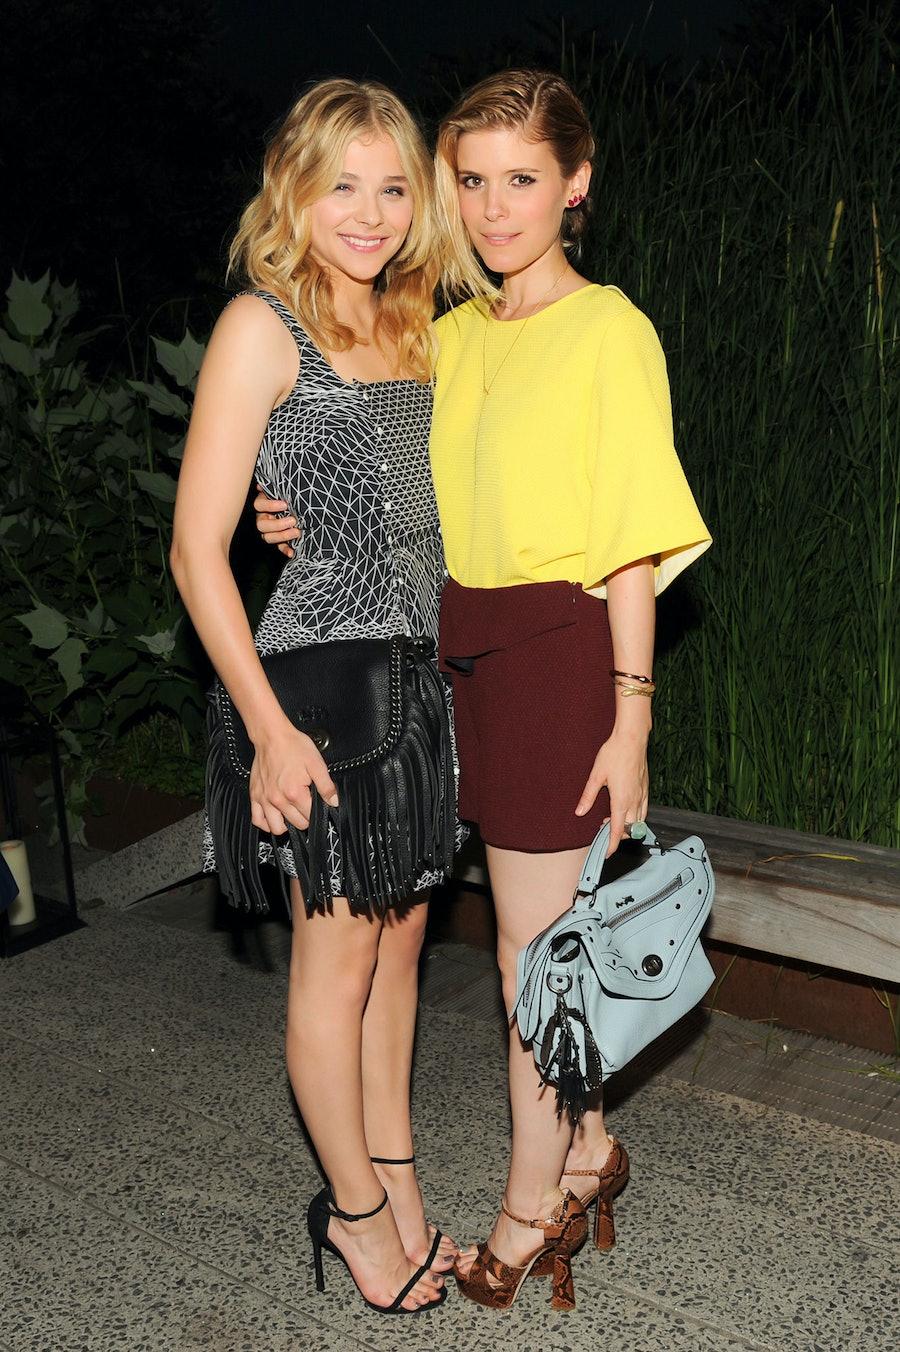 Chloe Grace Moretz and Kate Mara